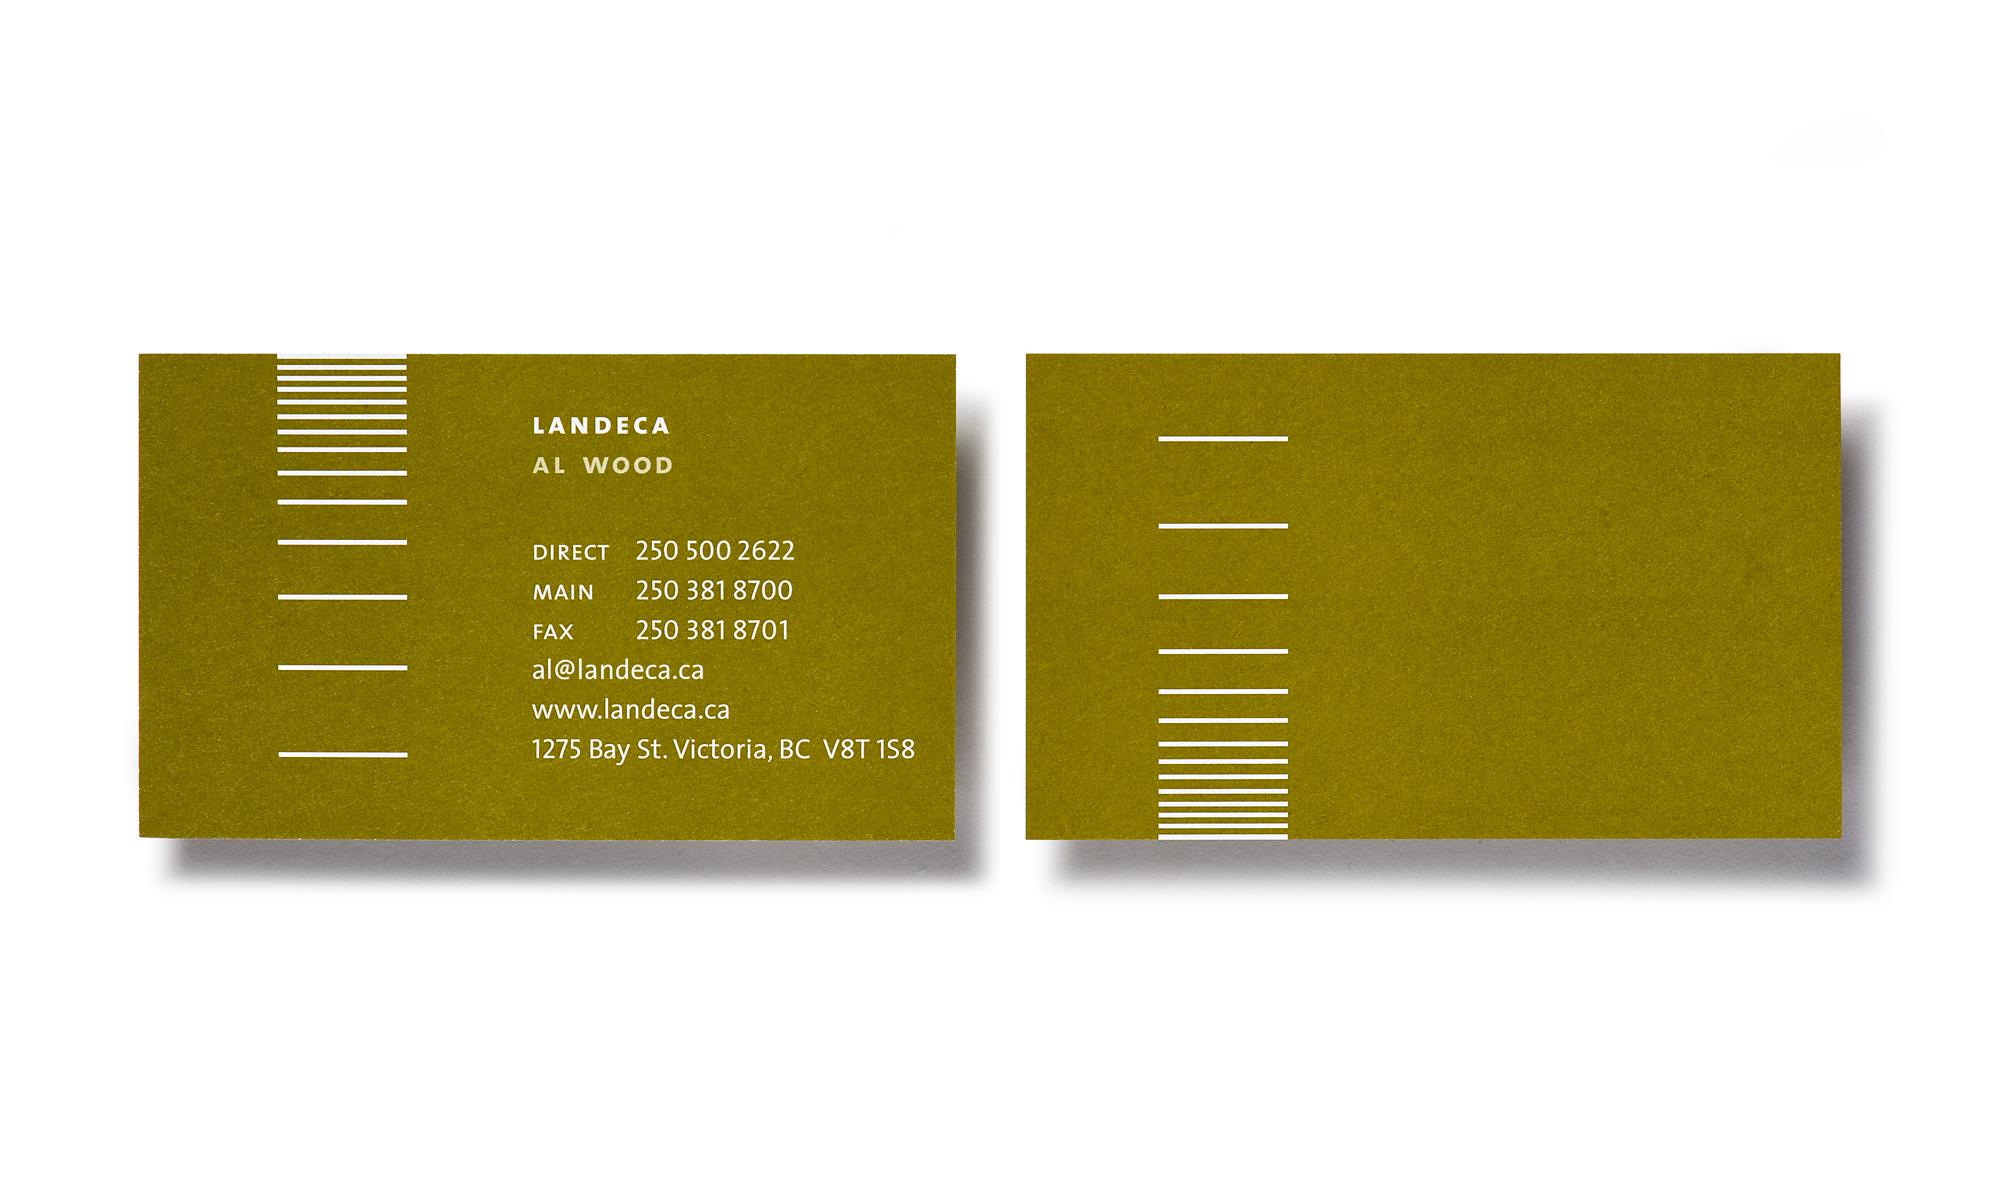 landeca_card2